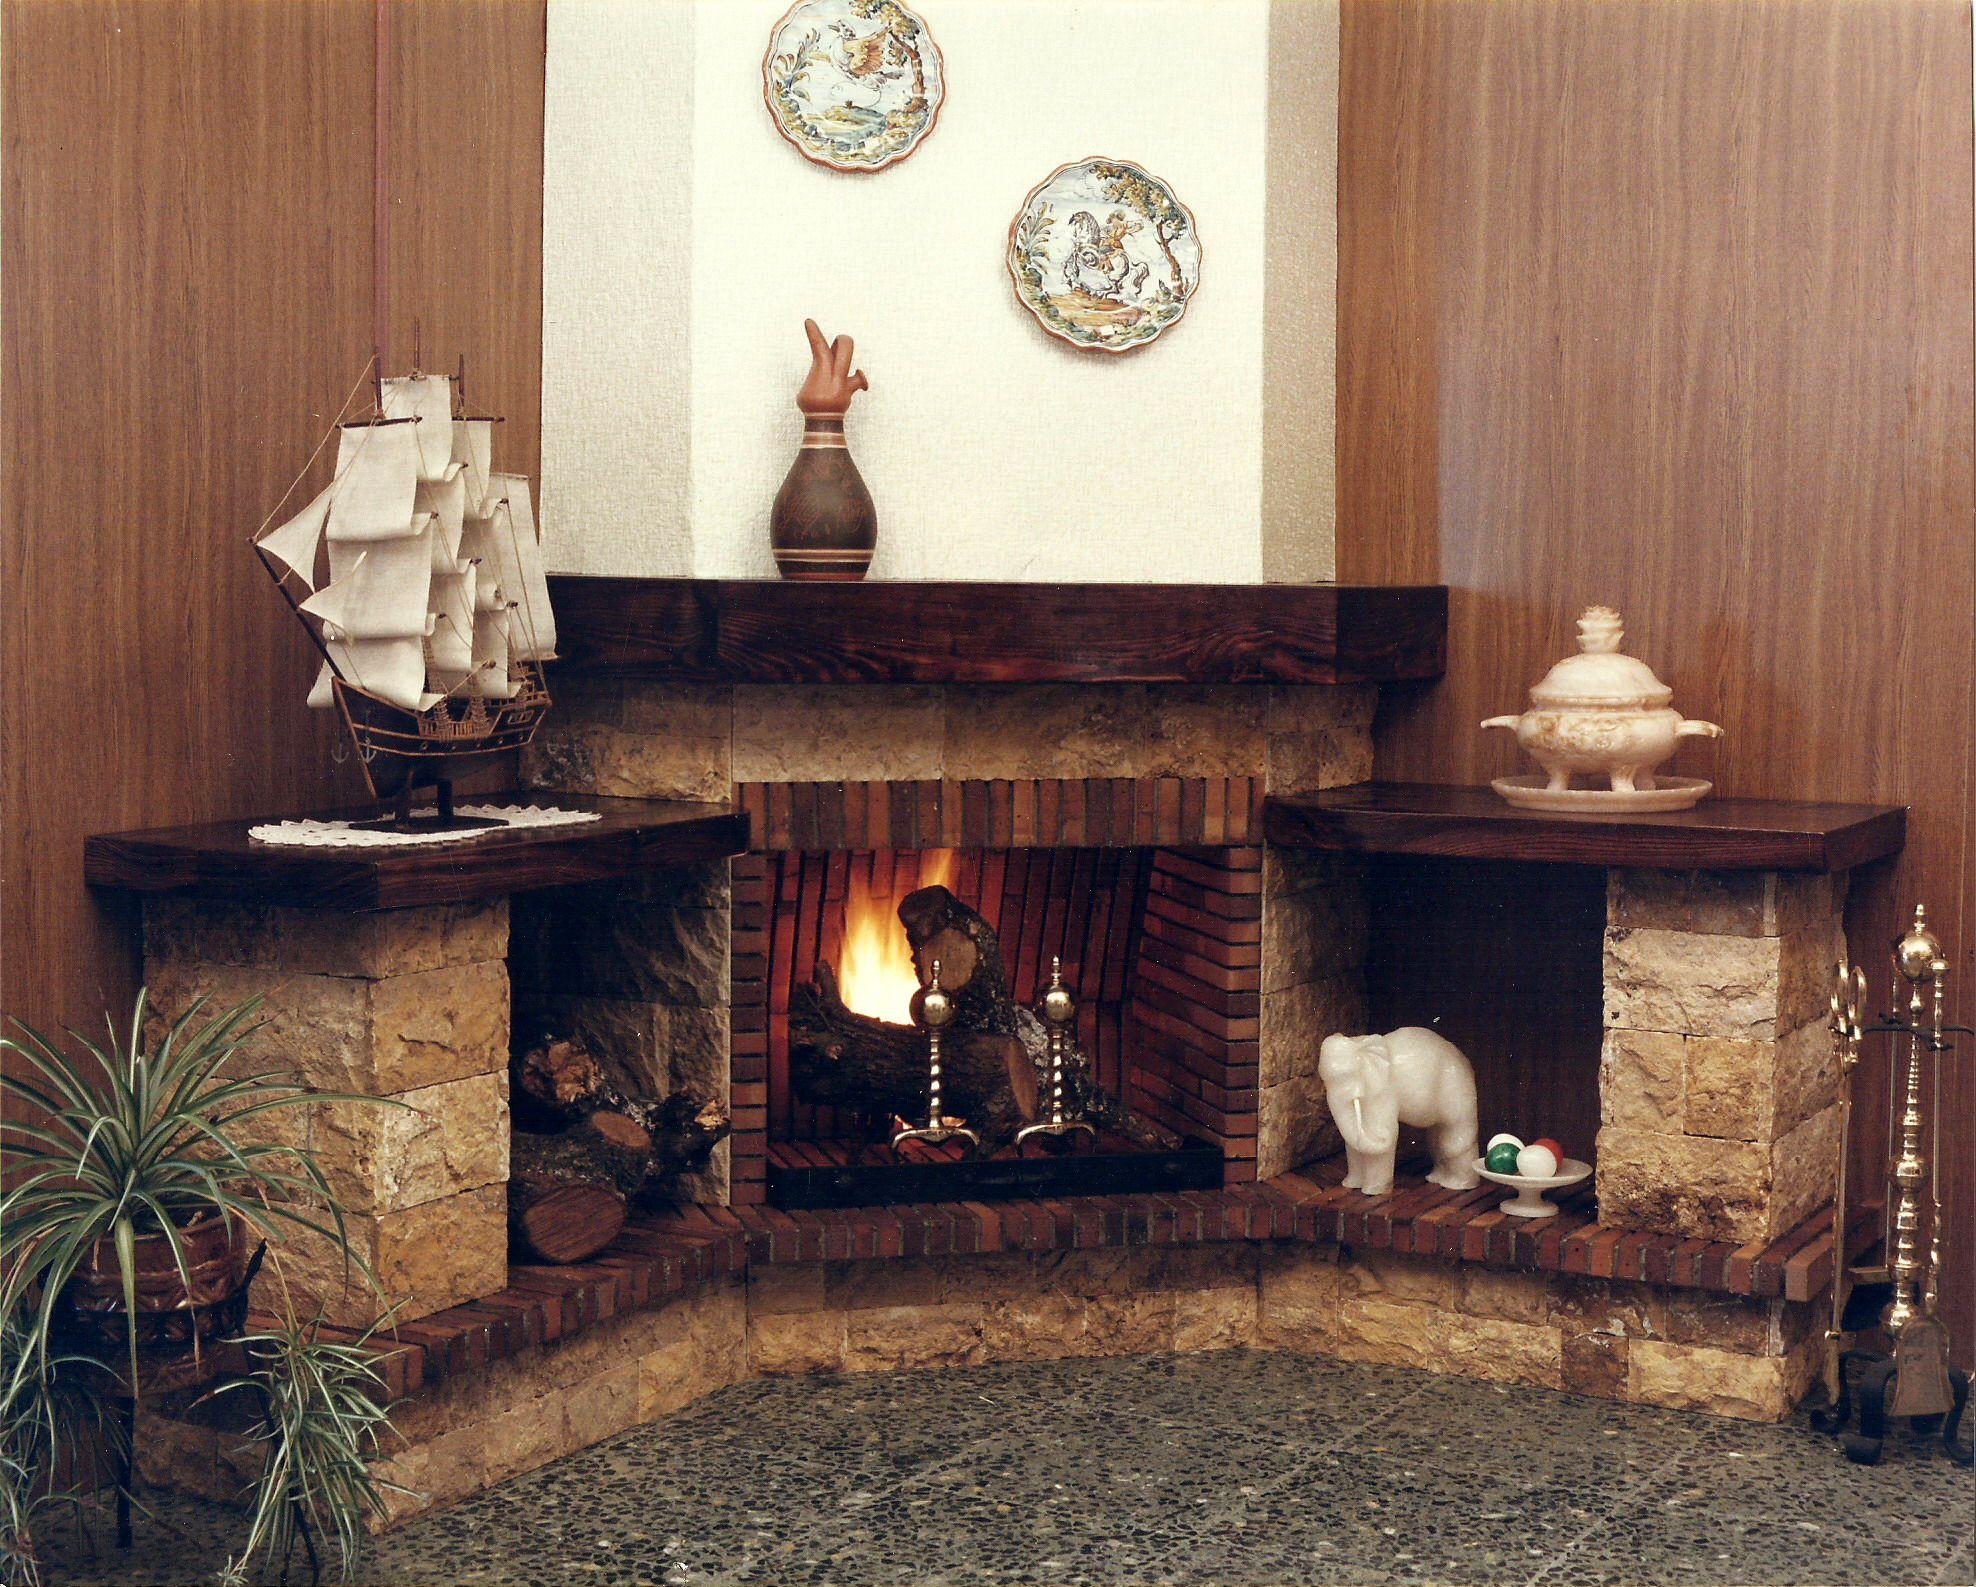 Salas con chimeneas buscar con google chimeneas - Ver chimeneas rusticas ...